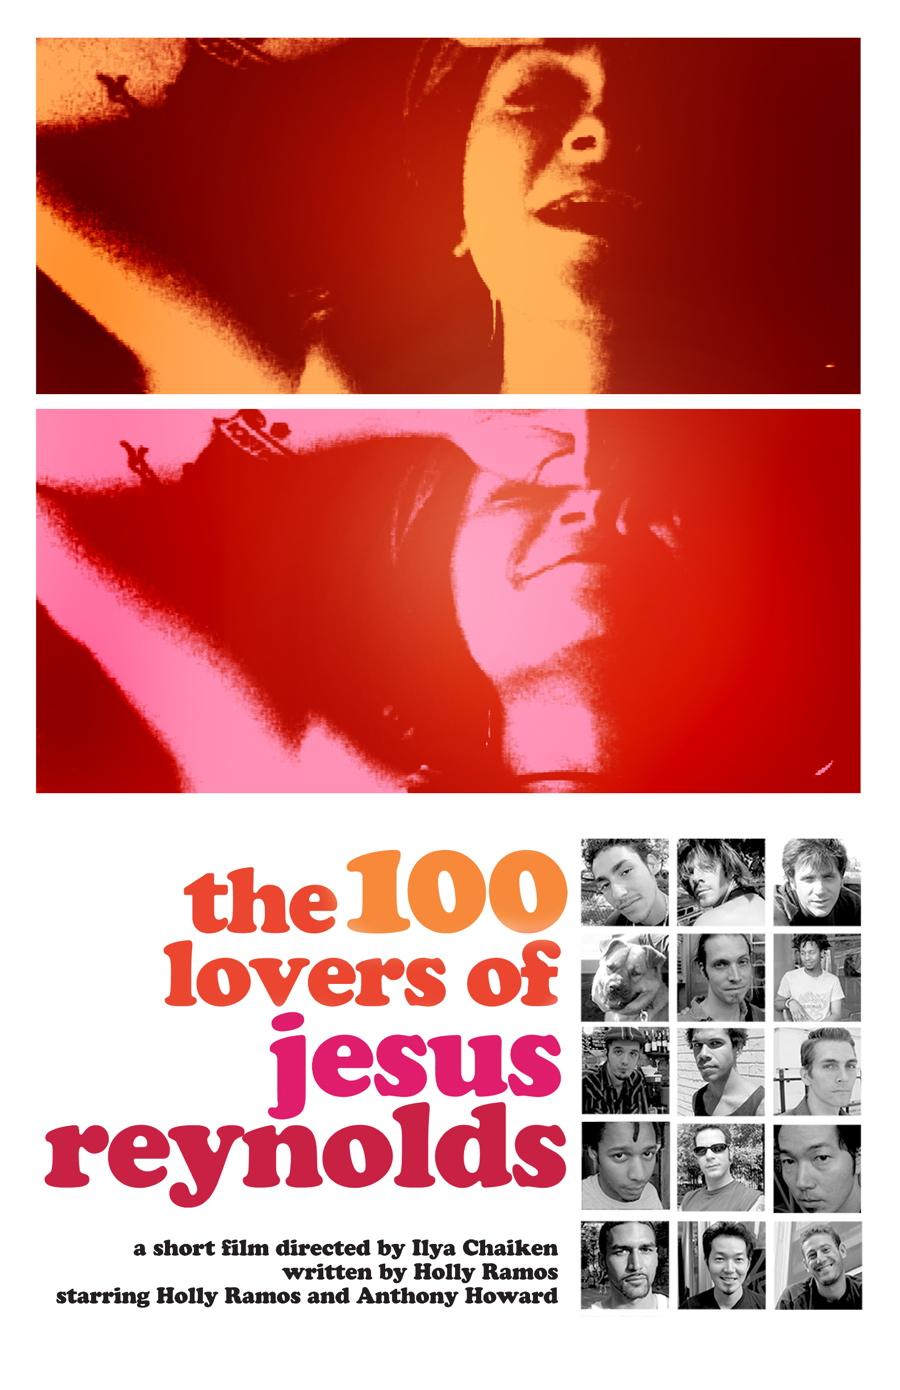 jesus_11x17 poster(1).jpg